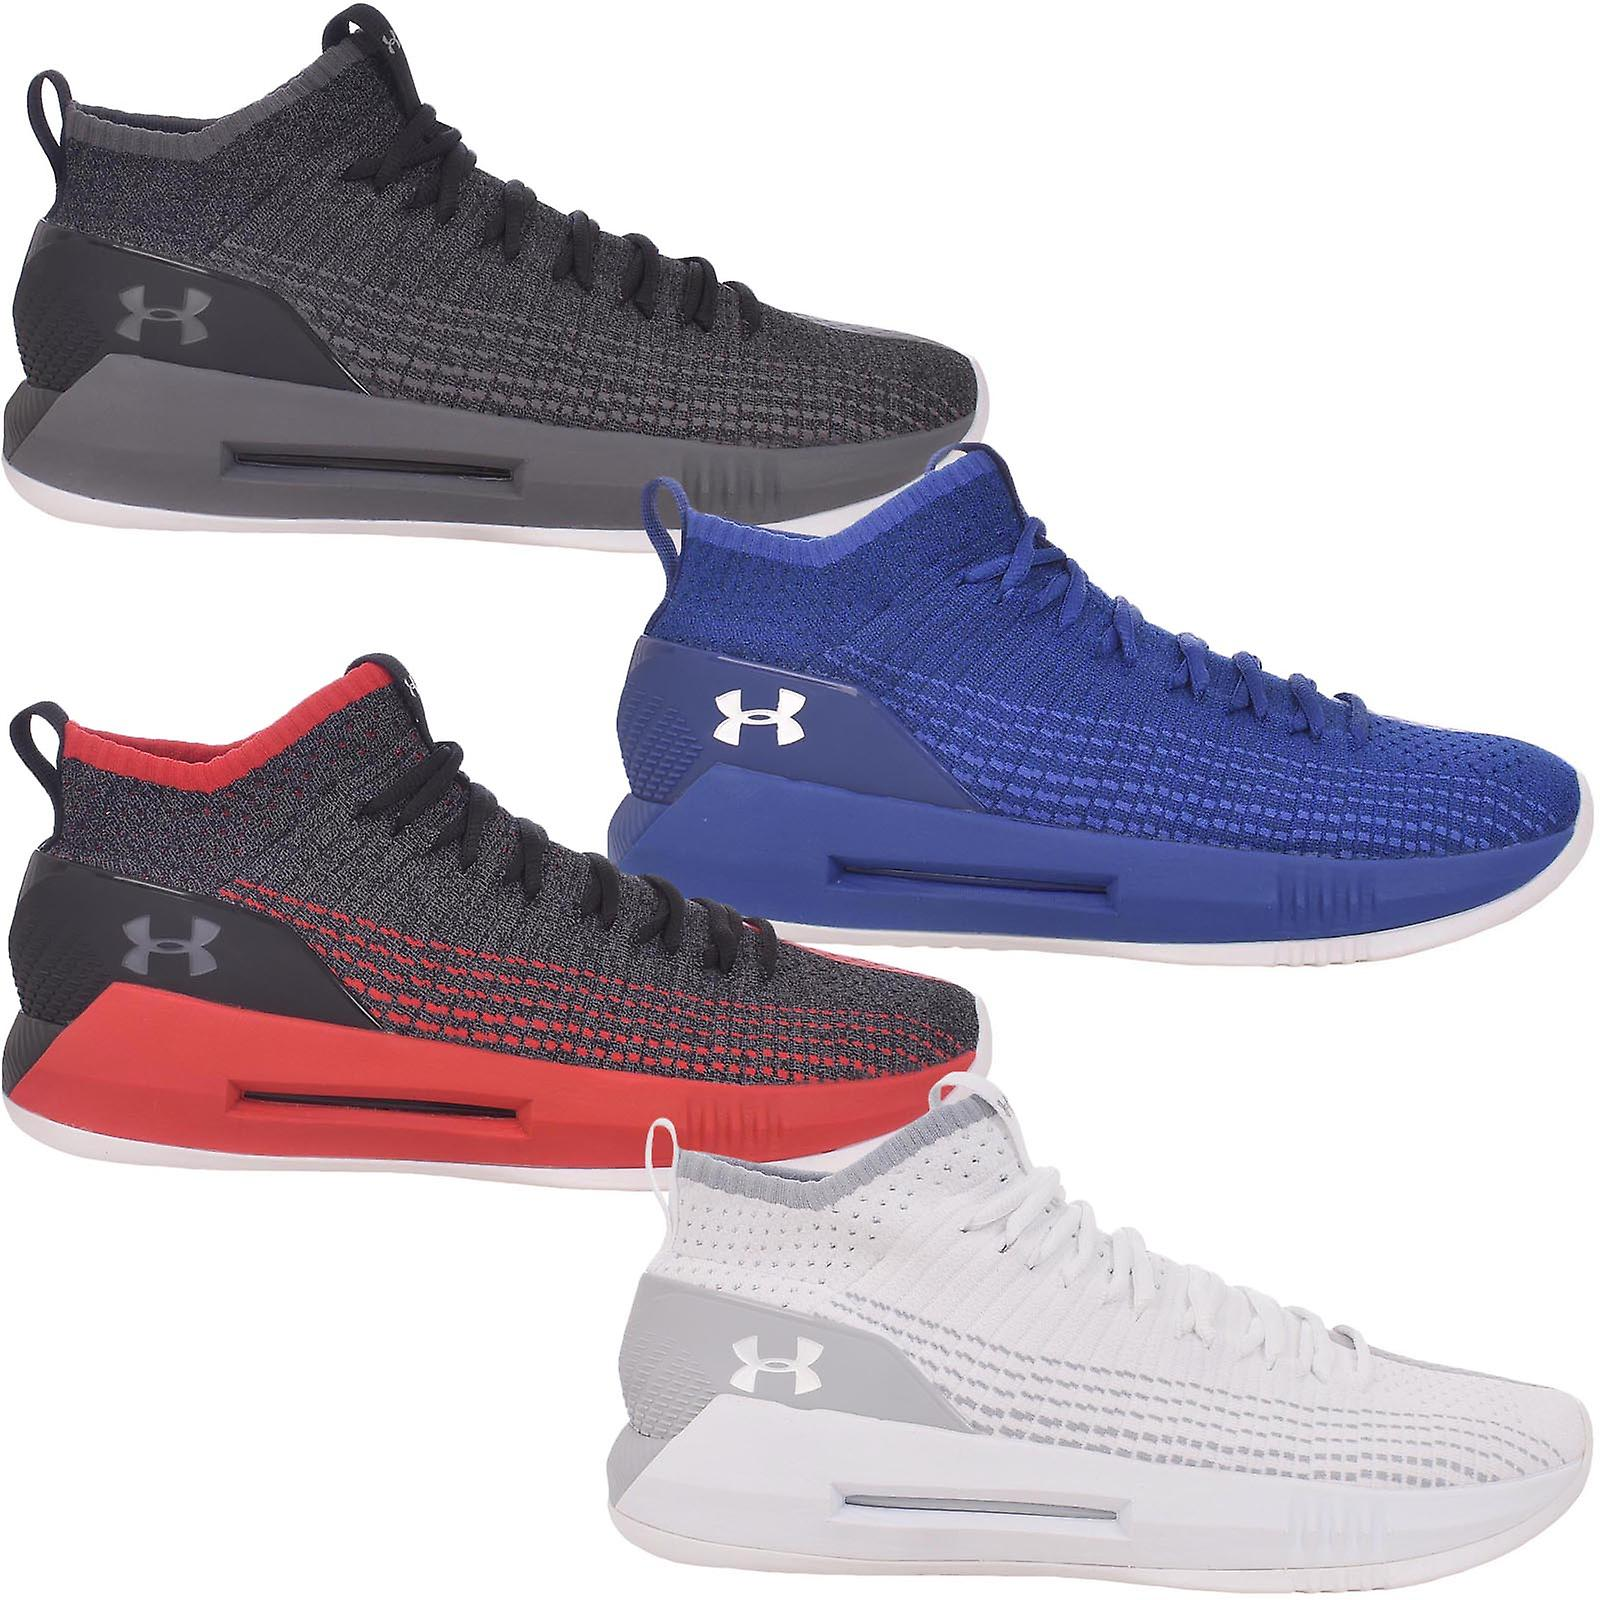 Under Armour Mens Ua Heat Seeker Basketball Shoes 11 UK